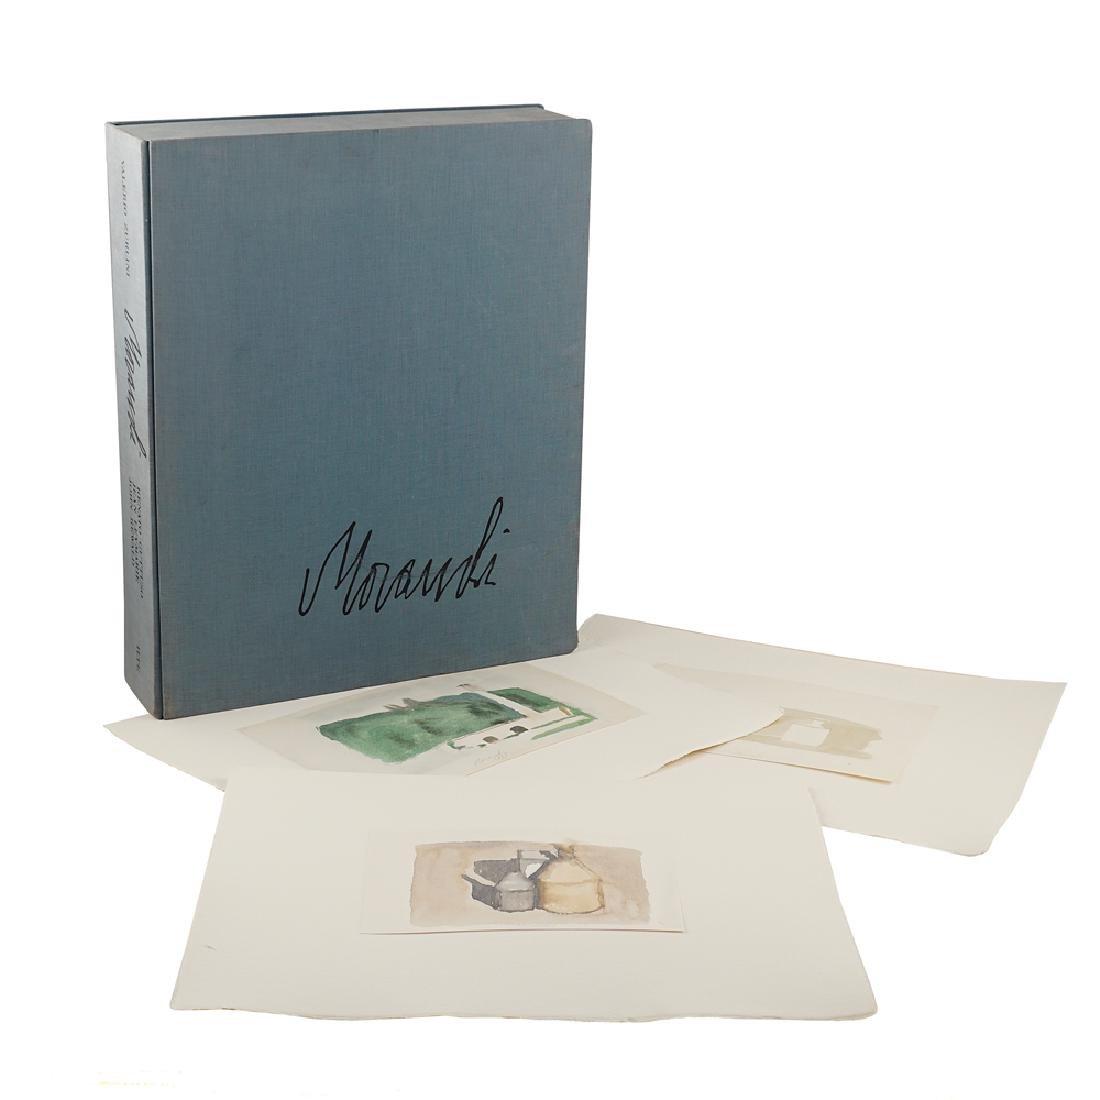 Giorgio Morandi Folder Turin 1973 52x42x11 cm.